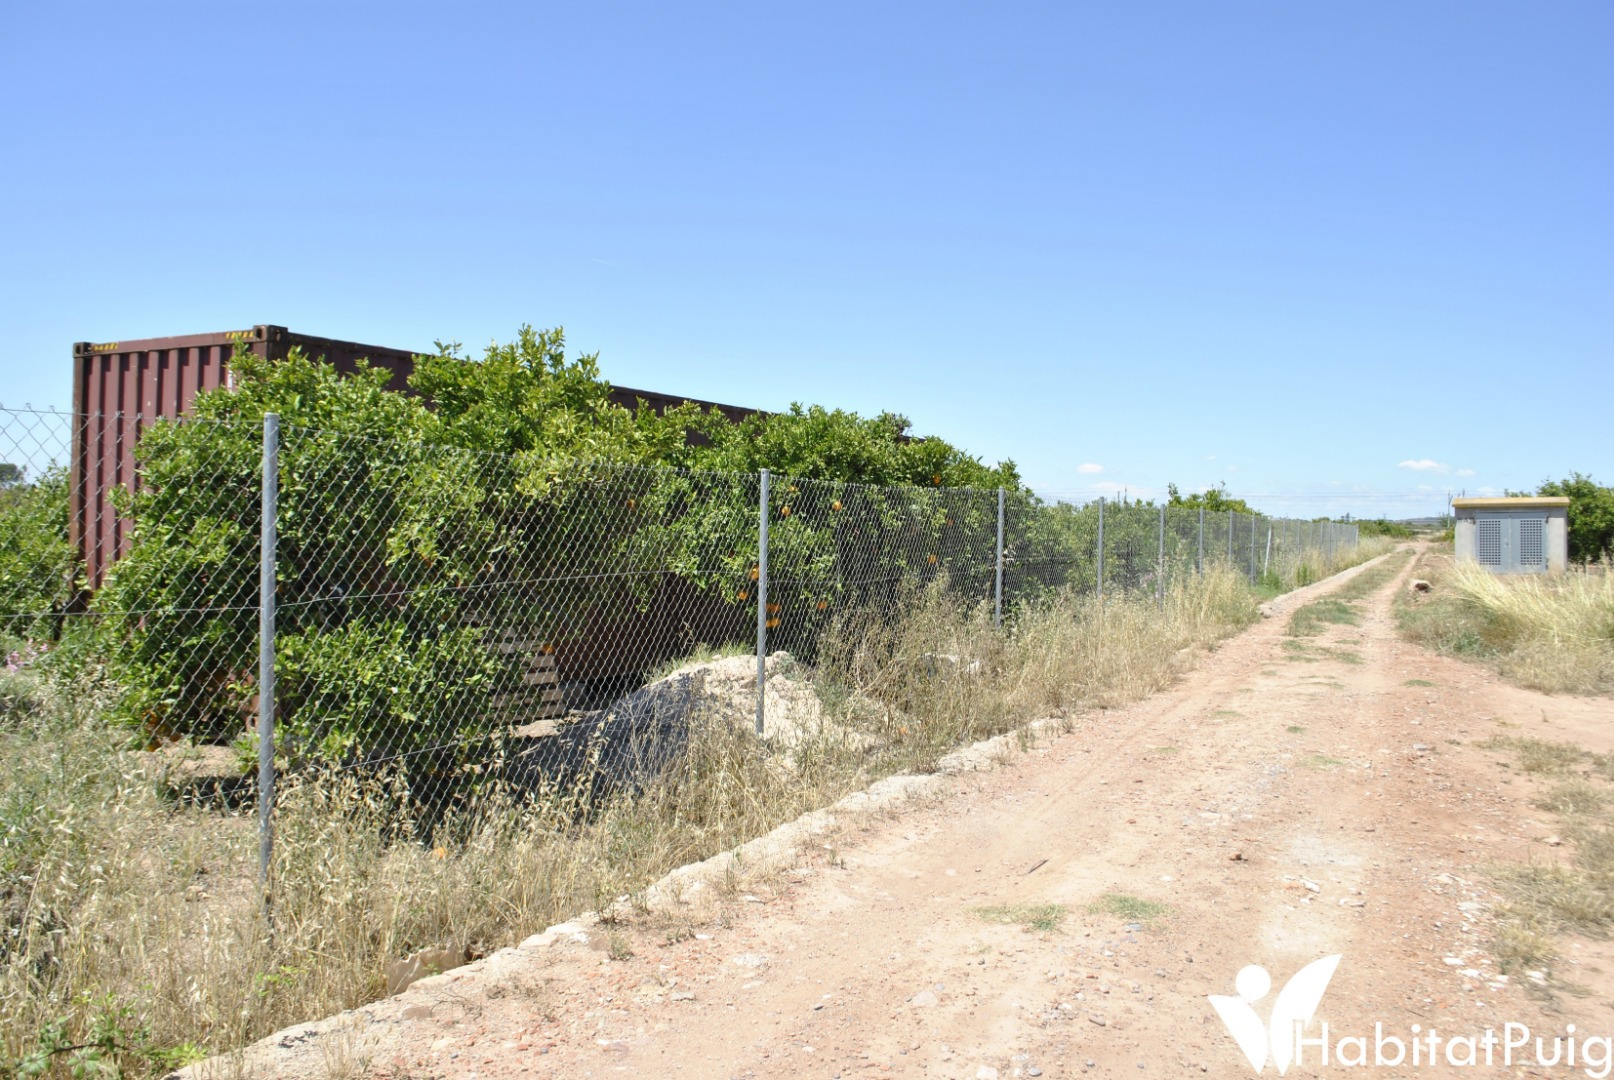 Solar urbà  Avenida de les corts valencianes, 9. Parcela rústica en venta en el Puig!!